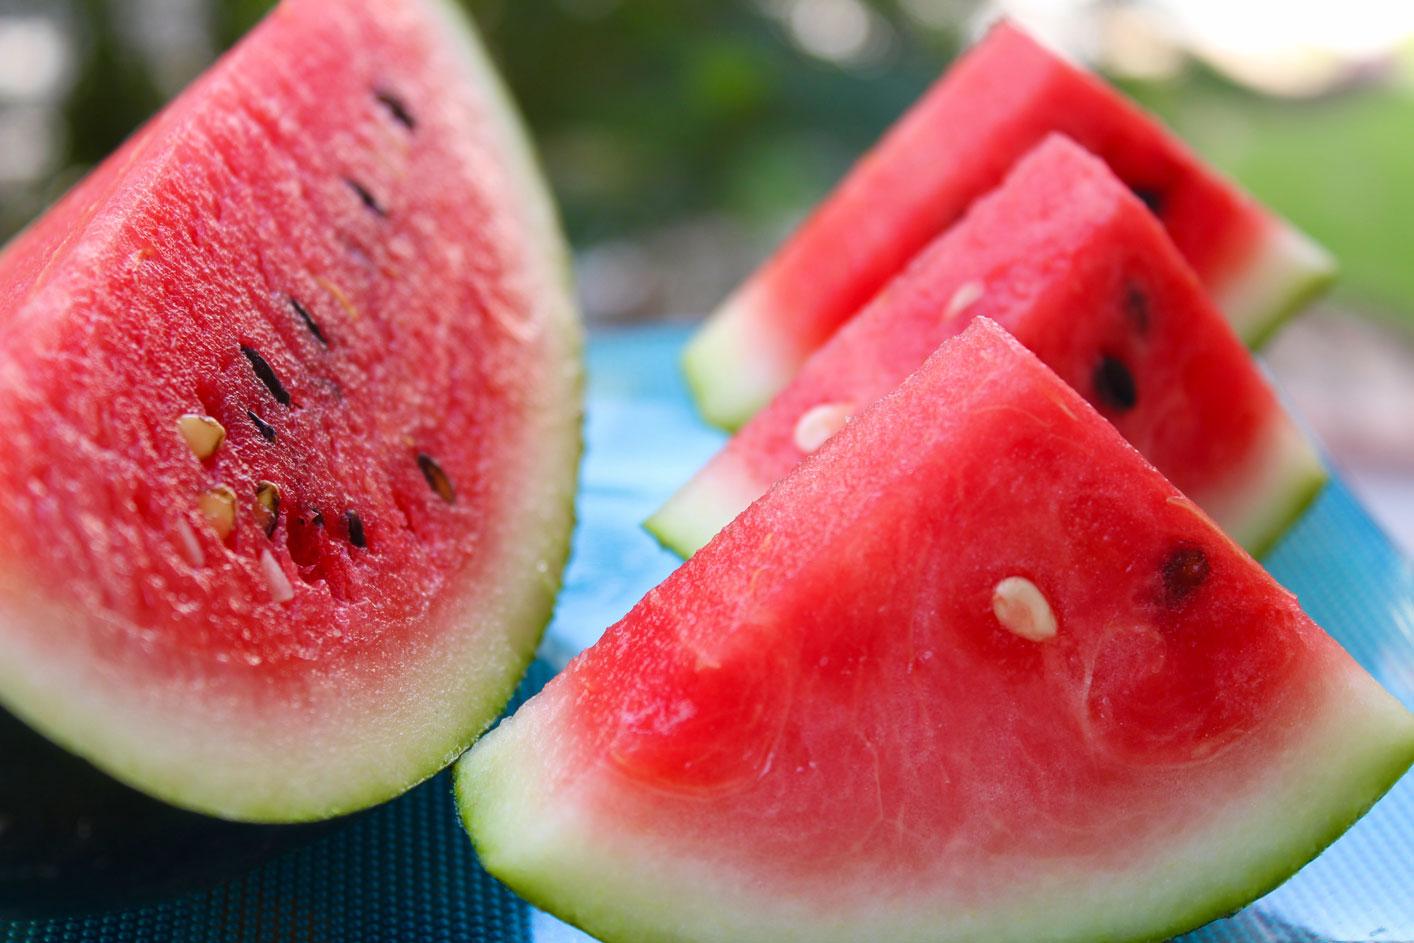 Citrulline, an amino acid found in watermelon